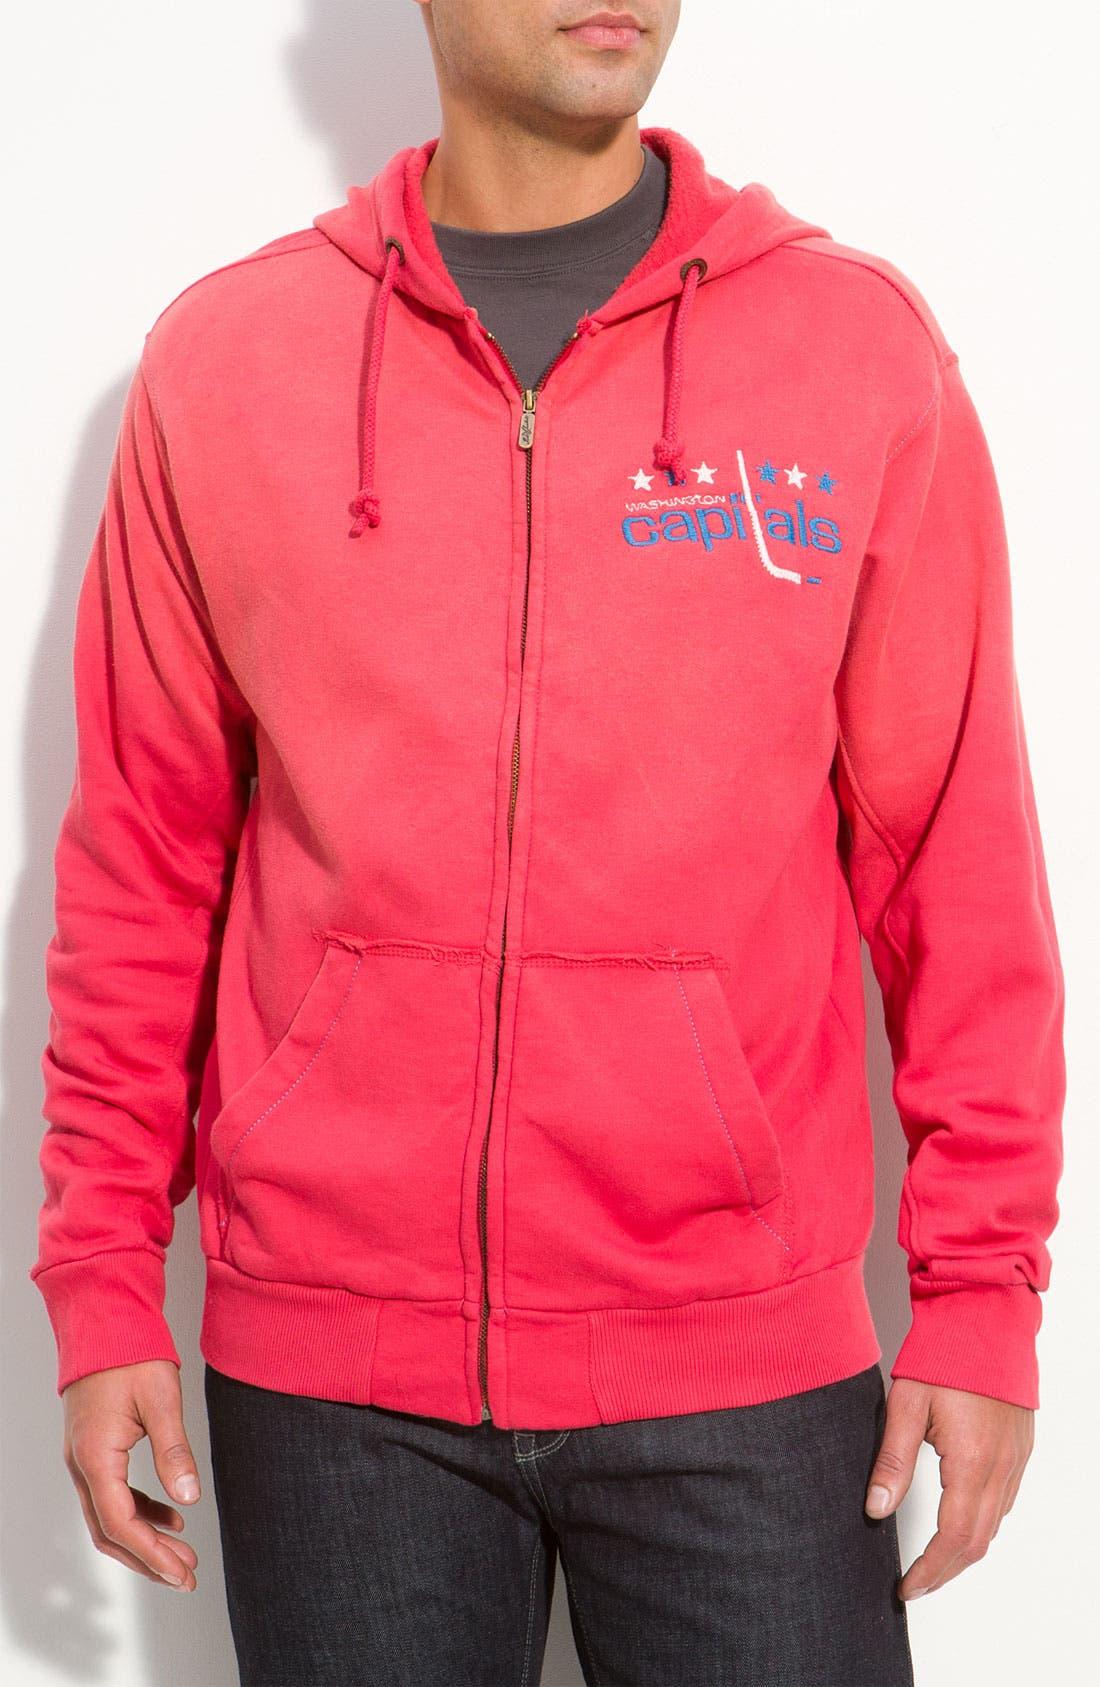 Main Image - Red Jacket 'Capitals' Hoodie